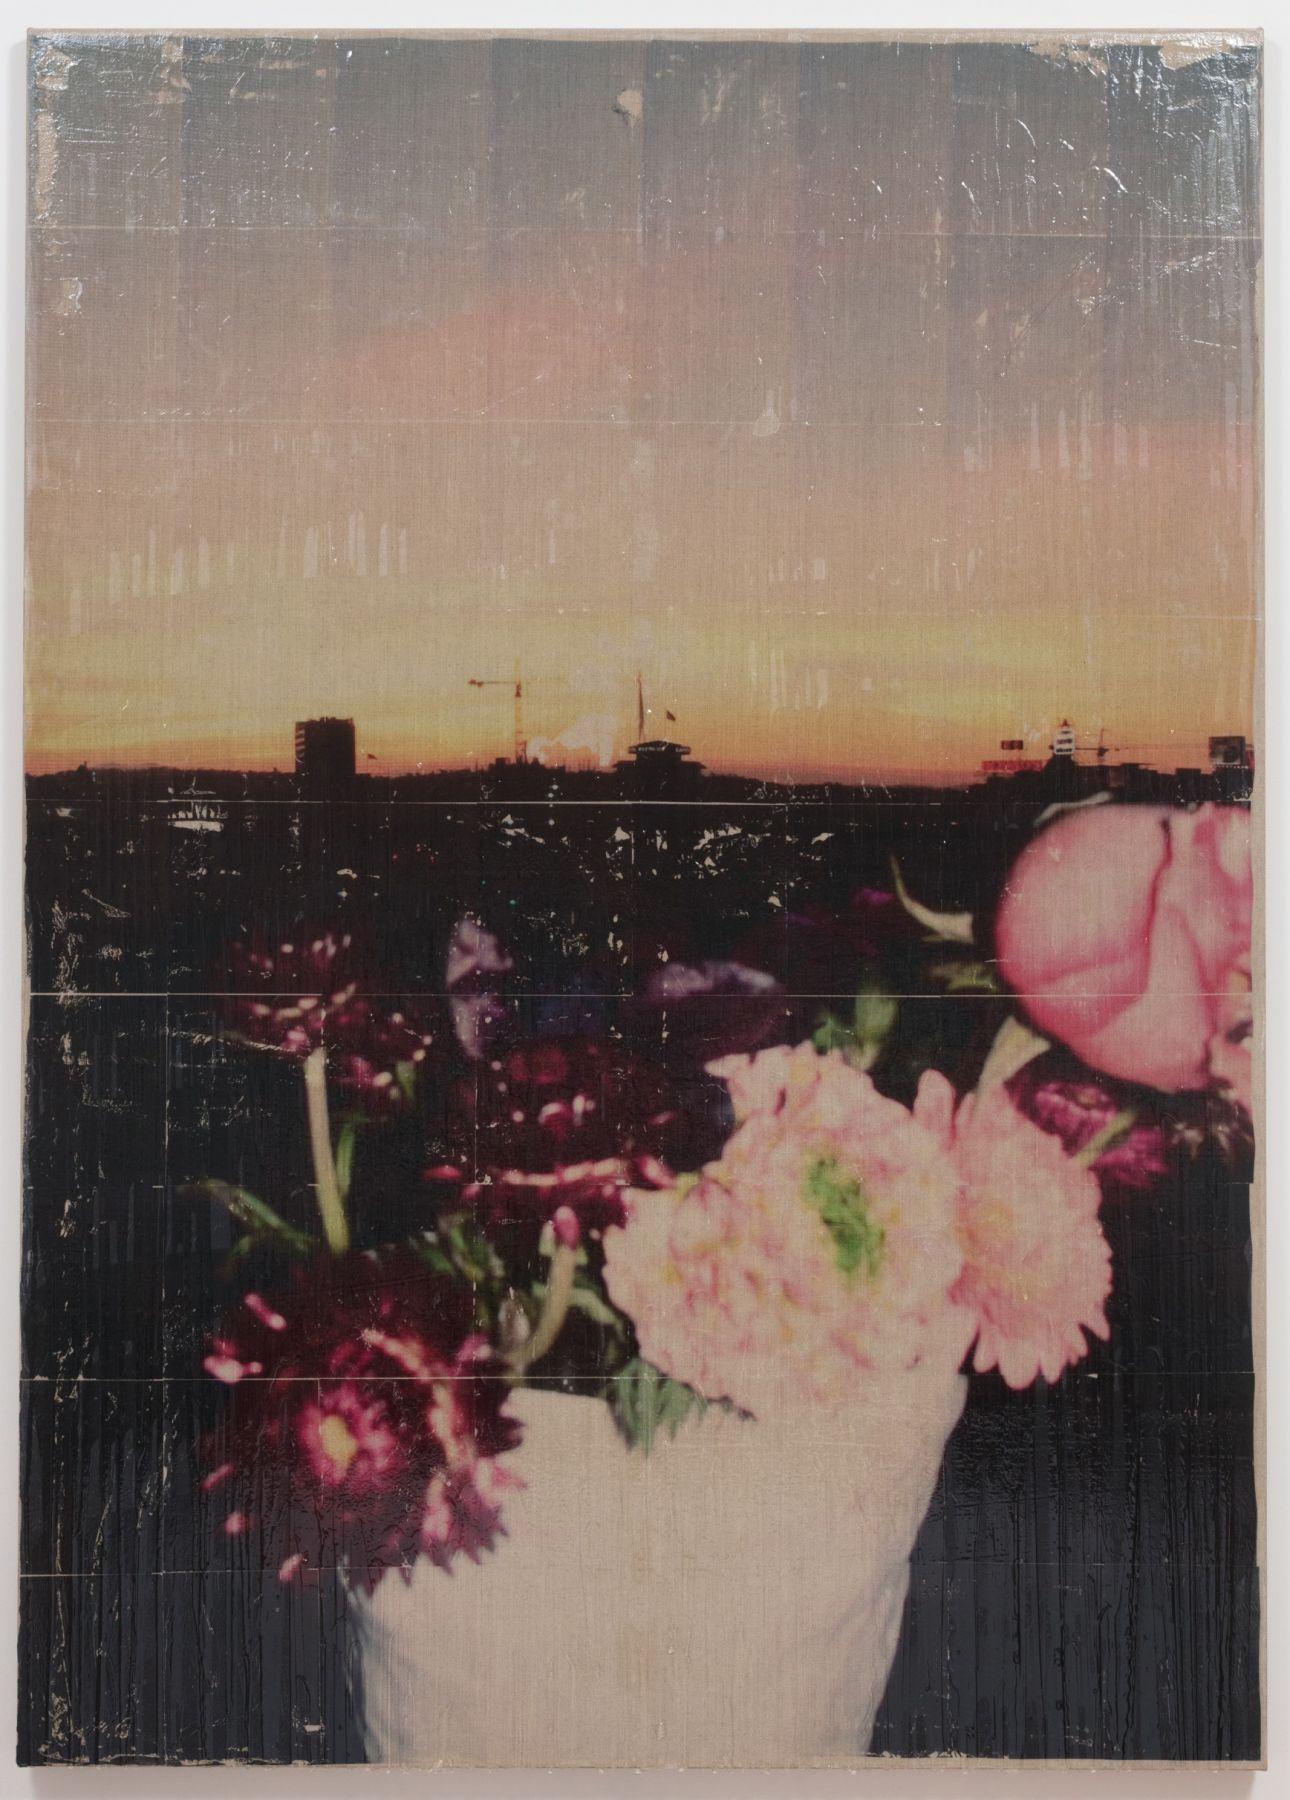 Parker Ito Capitol Records Shits Toots (sunrise bouquet w/ crane), 2016